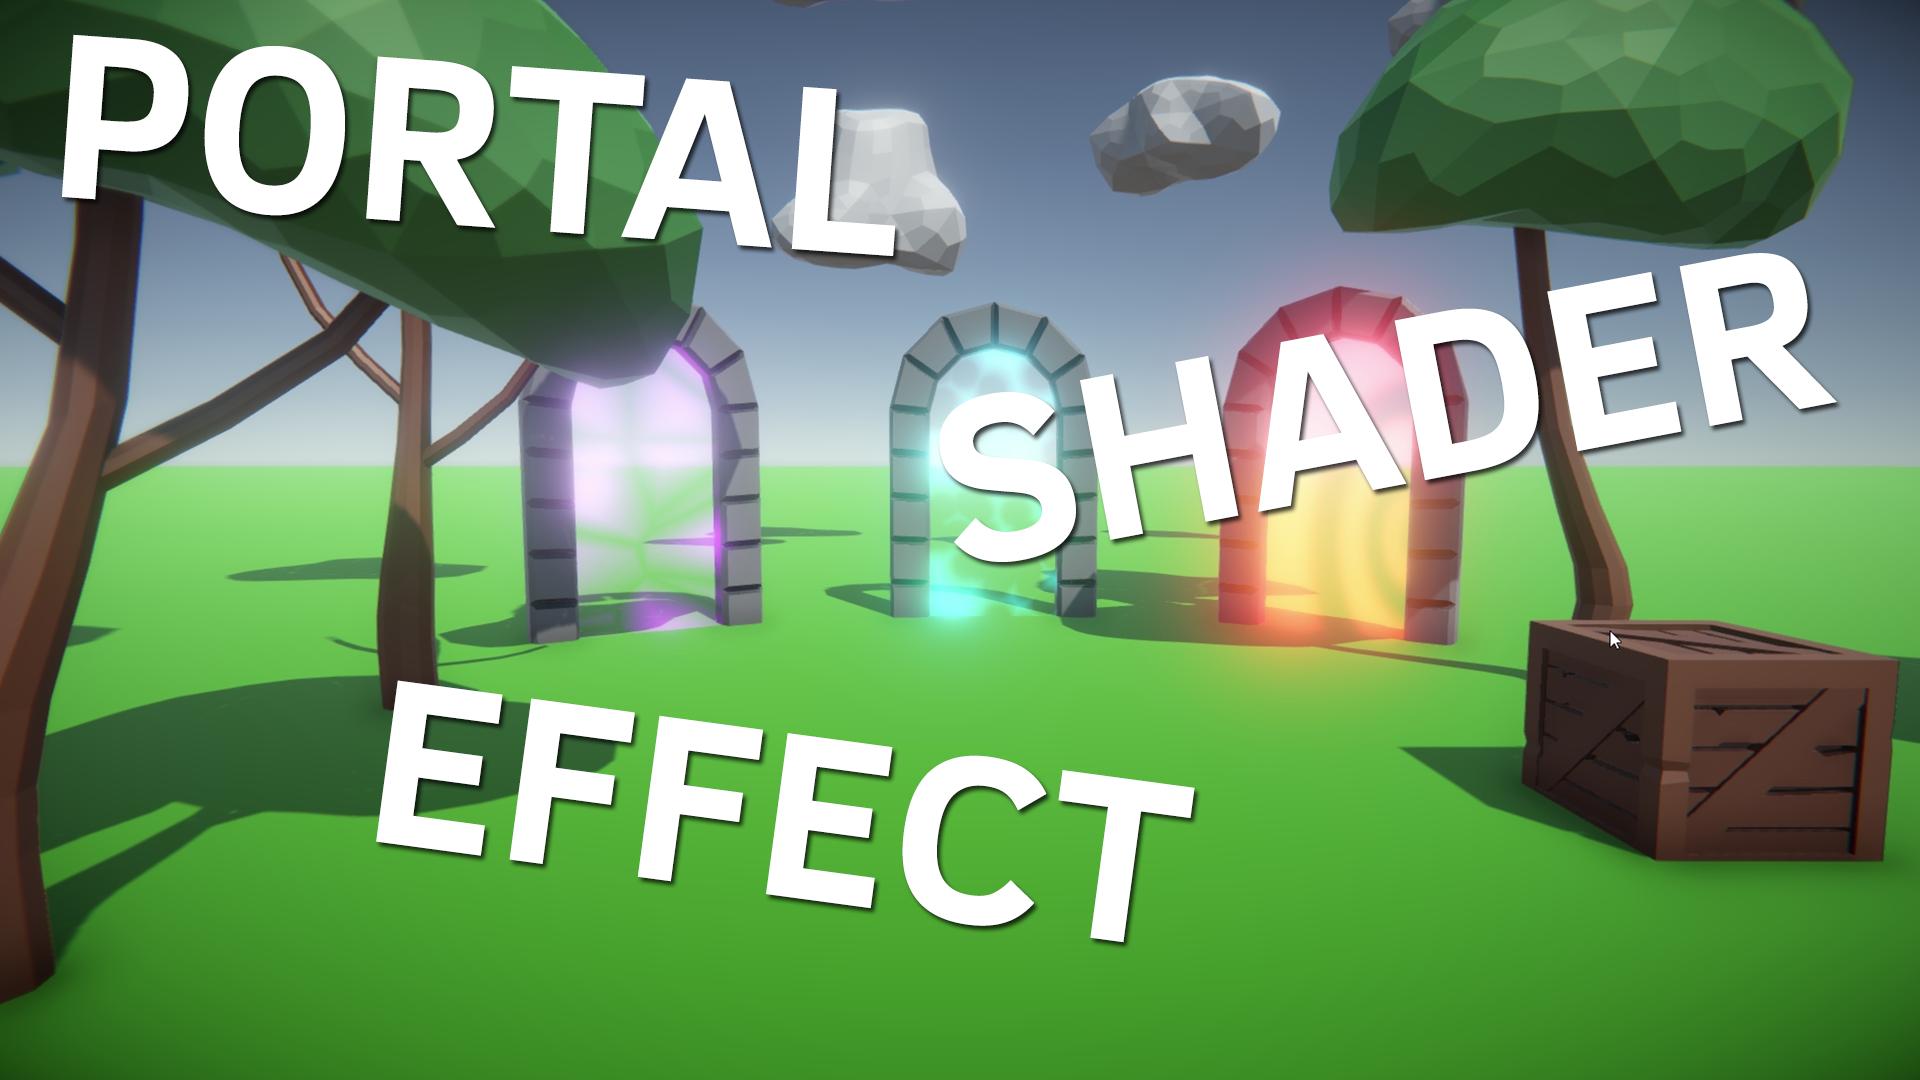 Portal Effect Shader